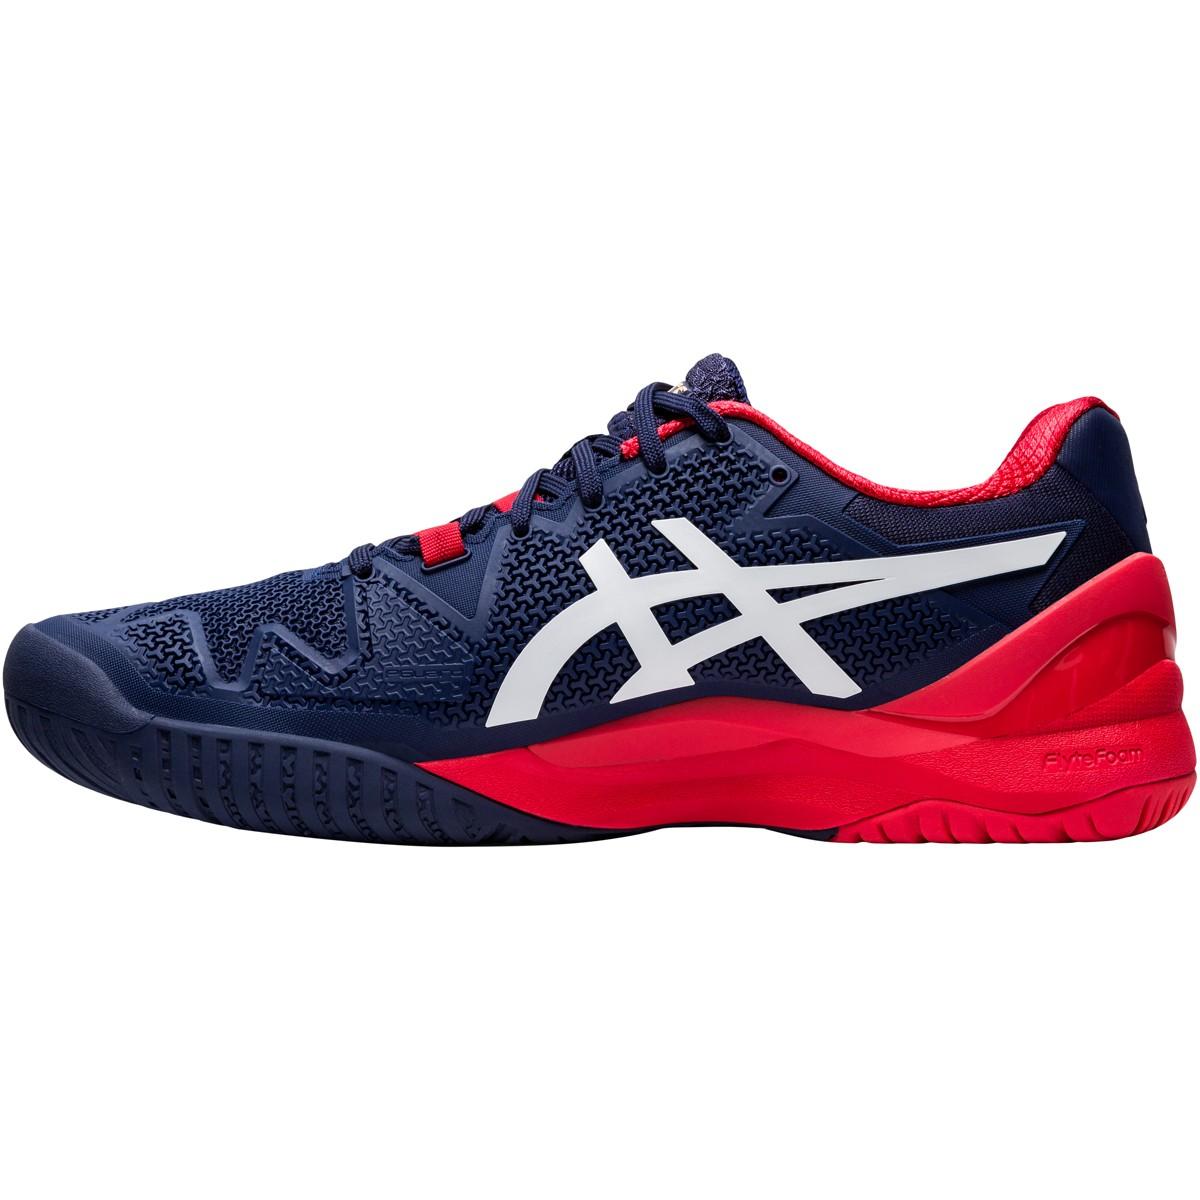 ASICS GEL RESOLUTION 8 ALL COURT SHOES - ASICS - Men's - Shoes ...